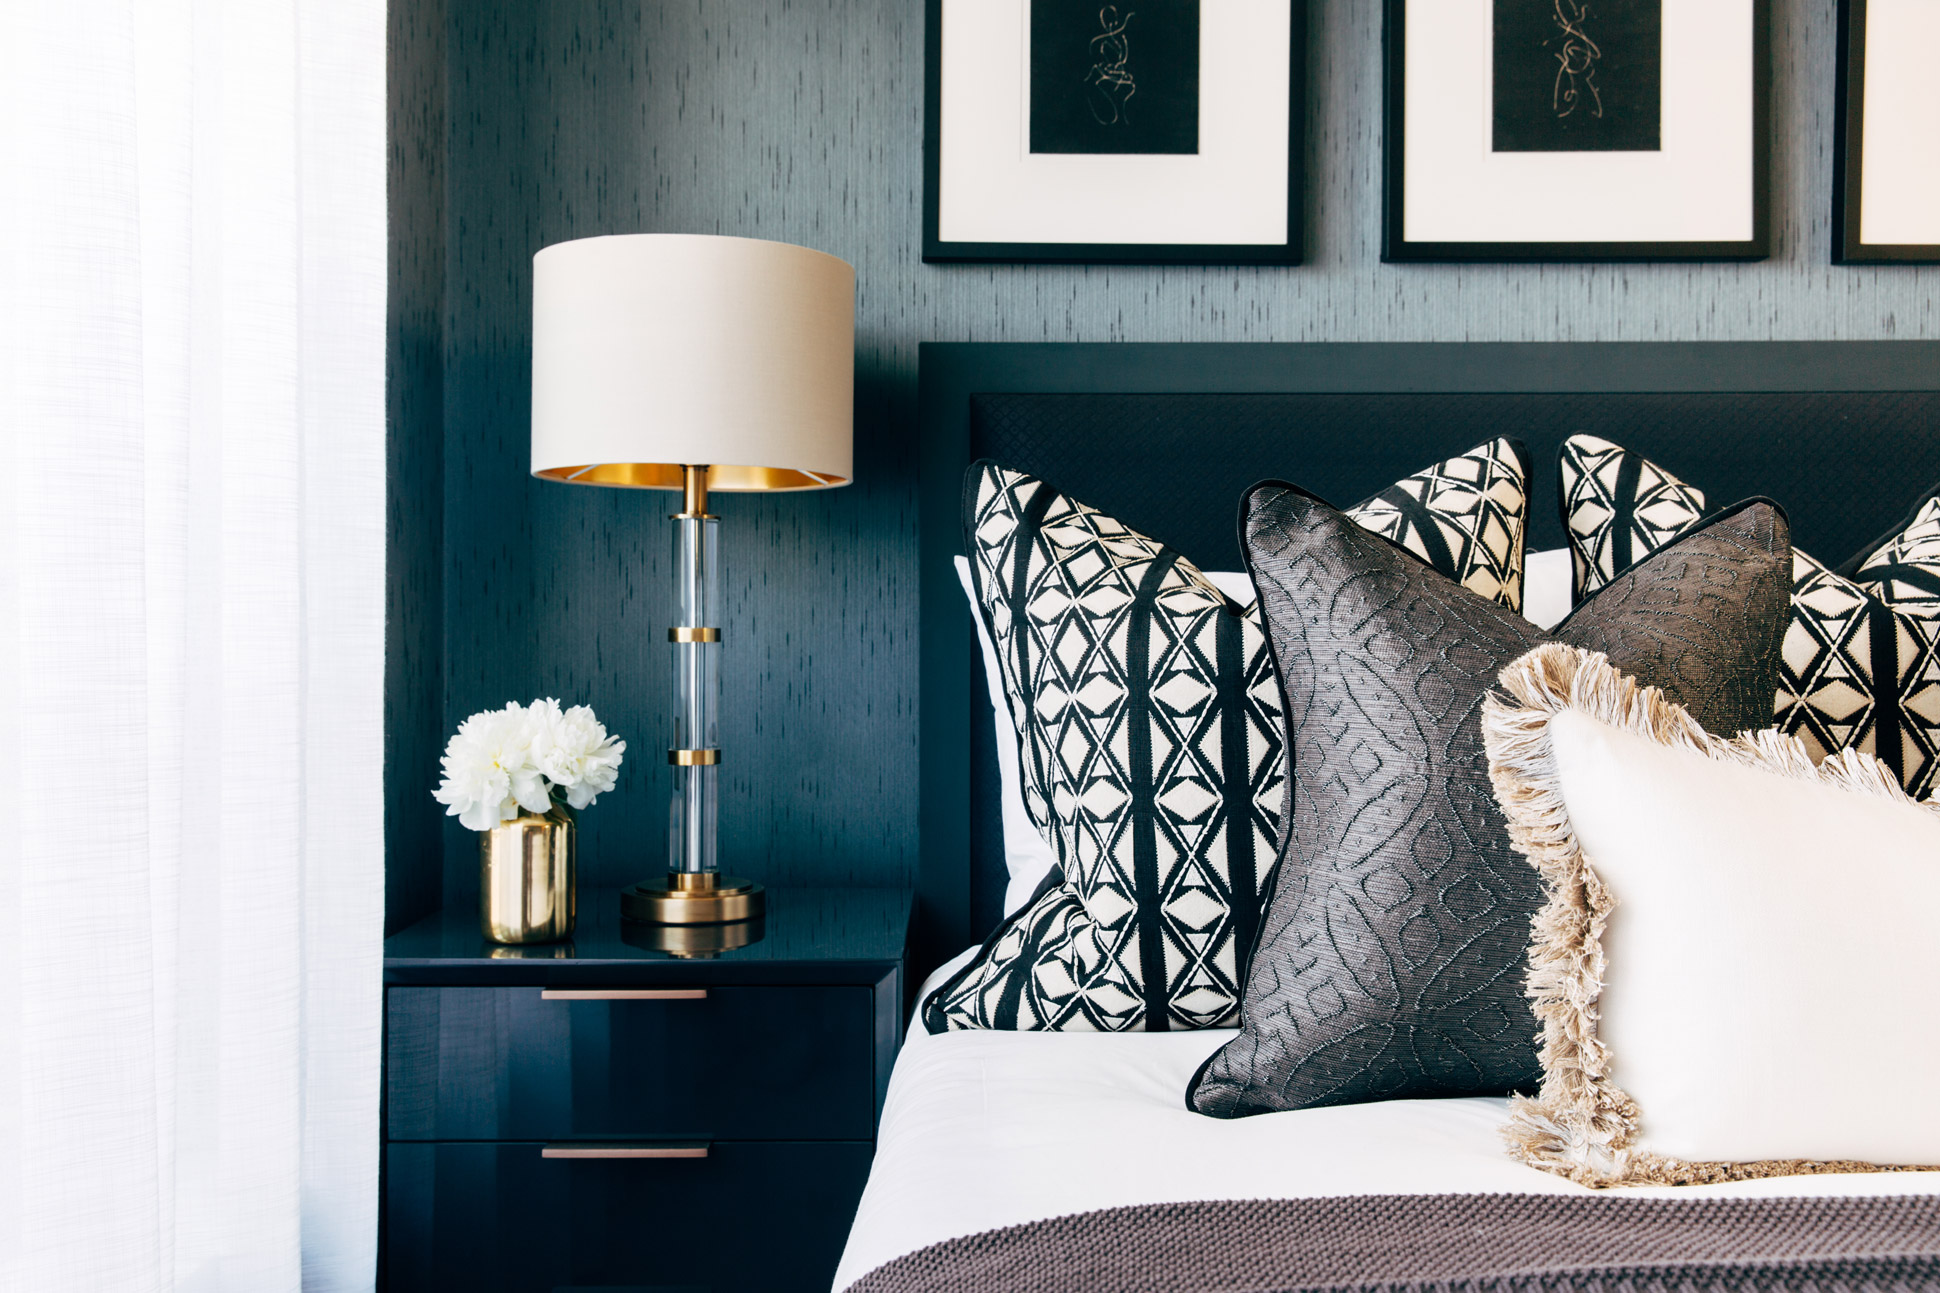 A_LONDON_Hamilton_Court_2_12_Bedroom.jpg